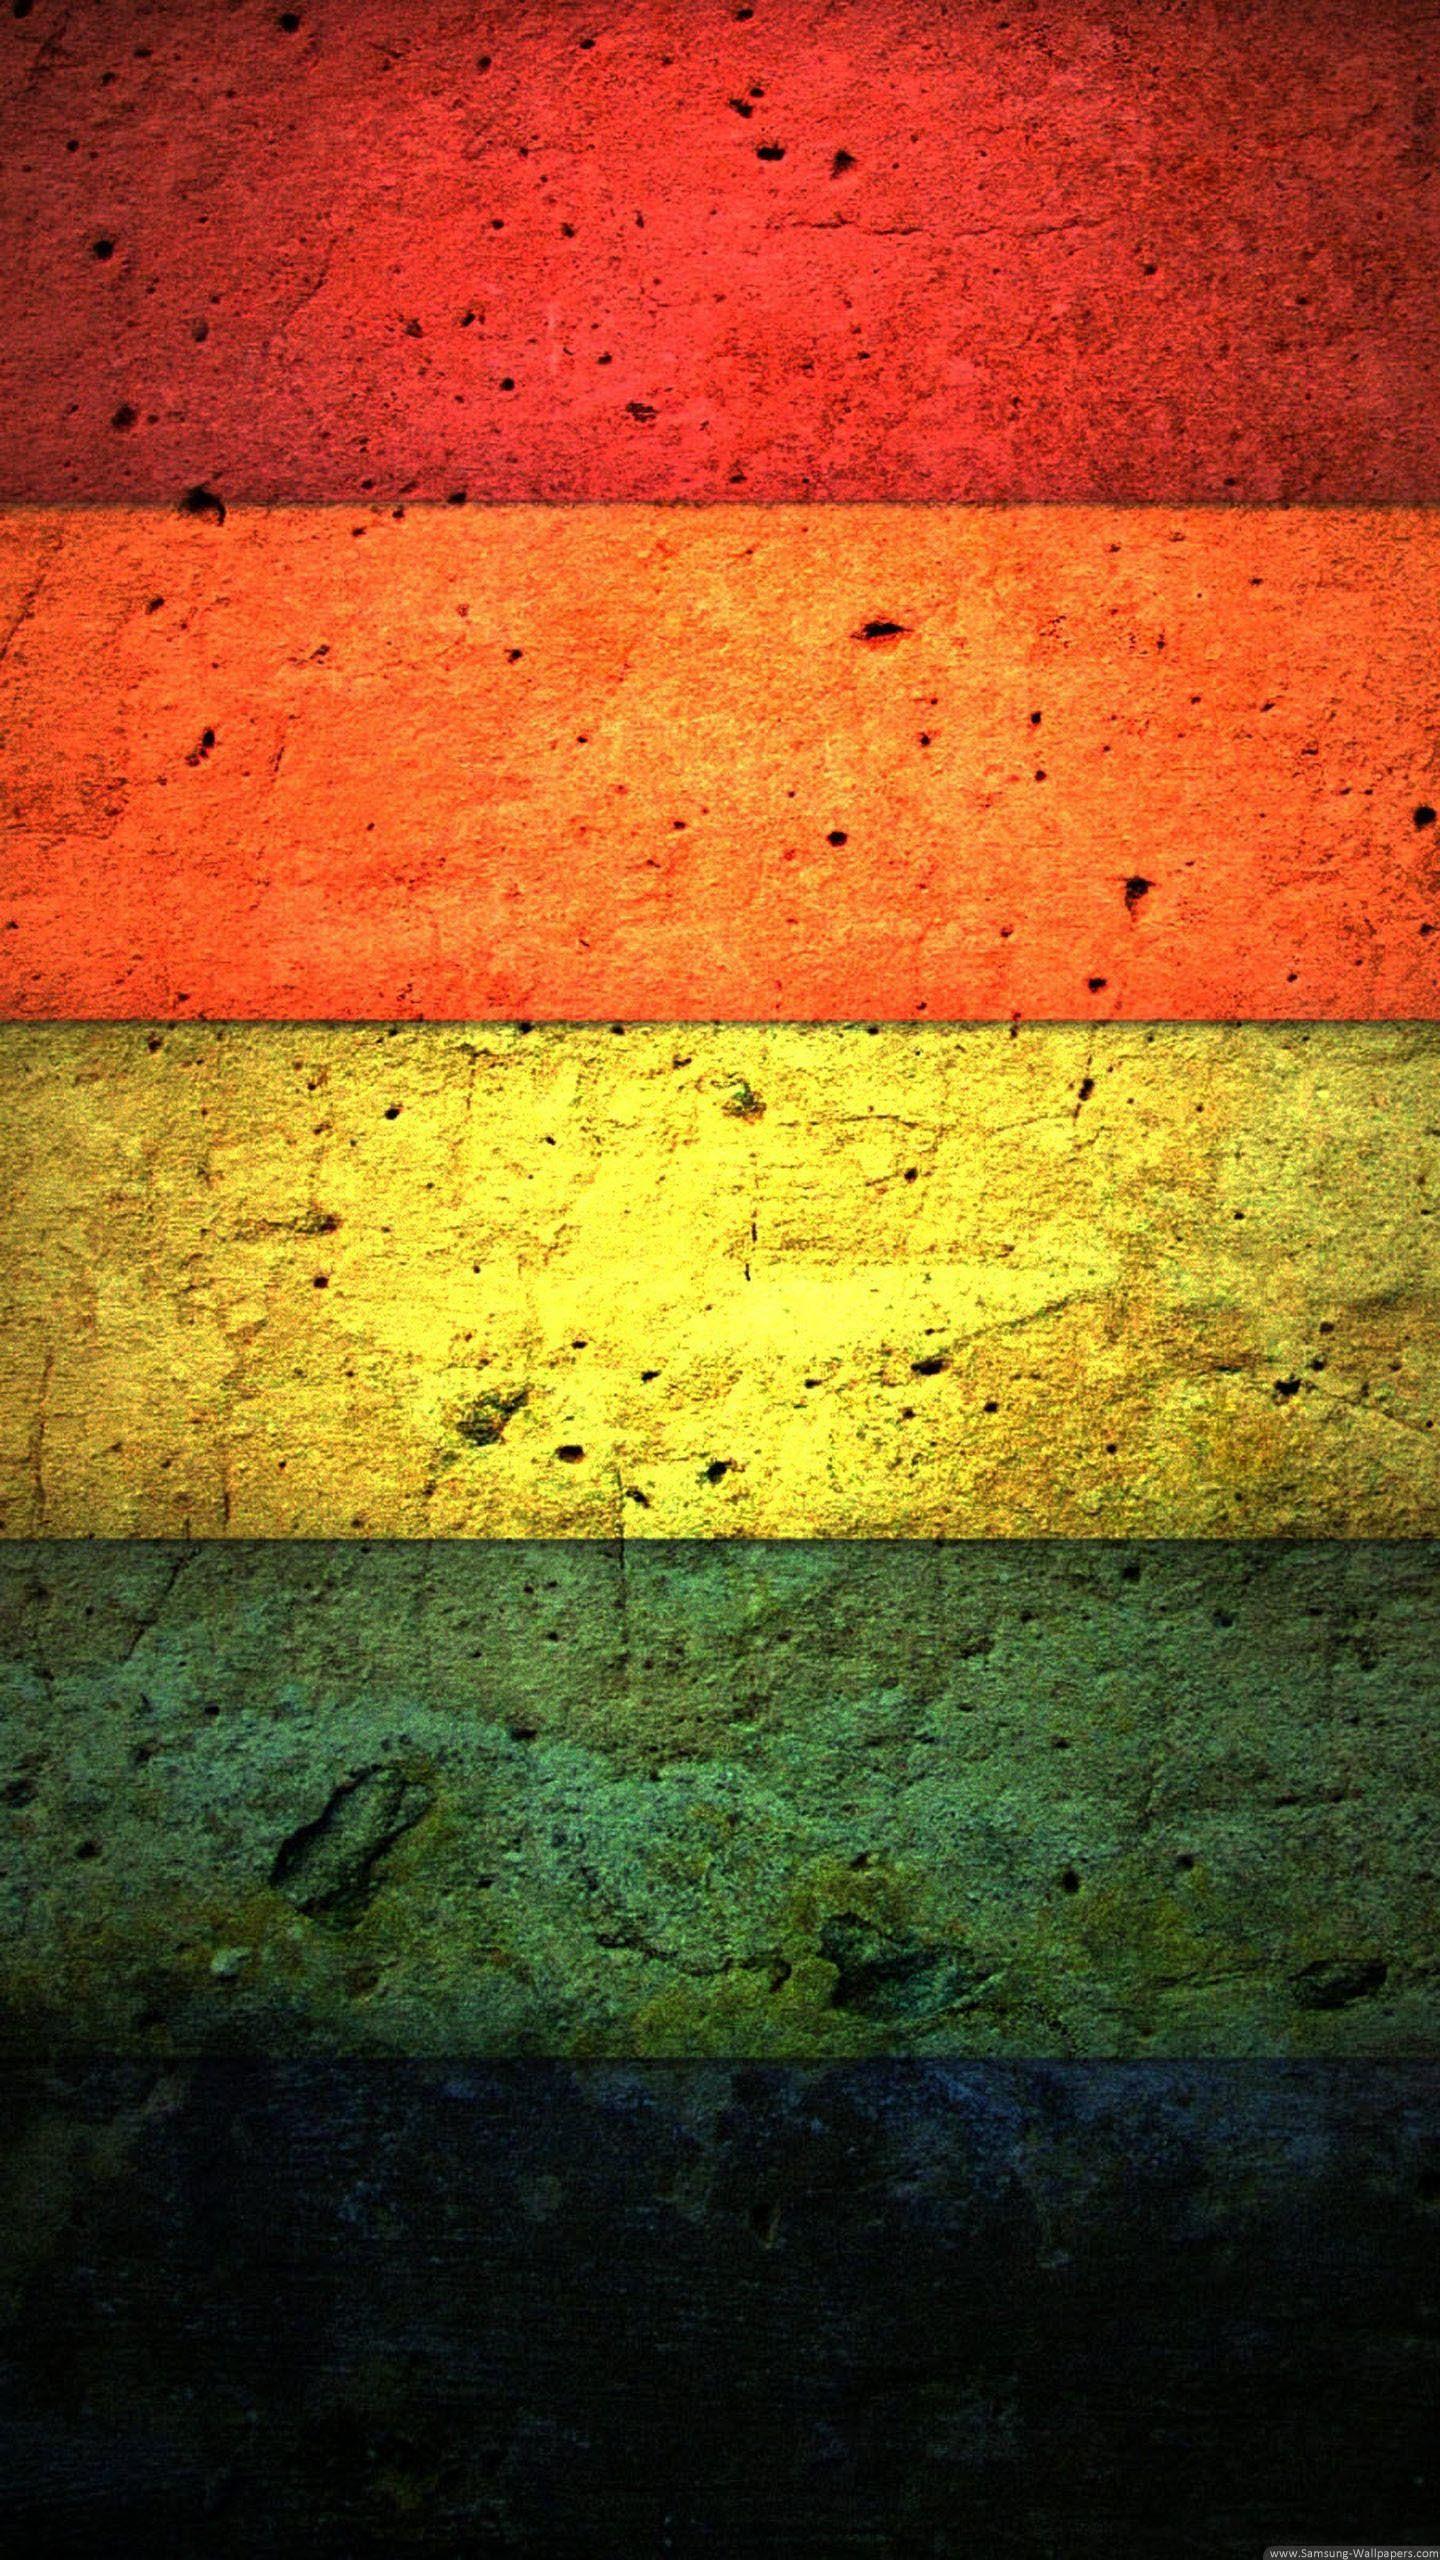 Lock Screen Hd Wallpapers 77 Images